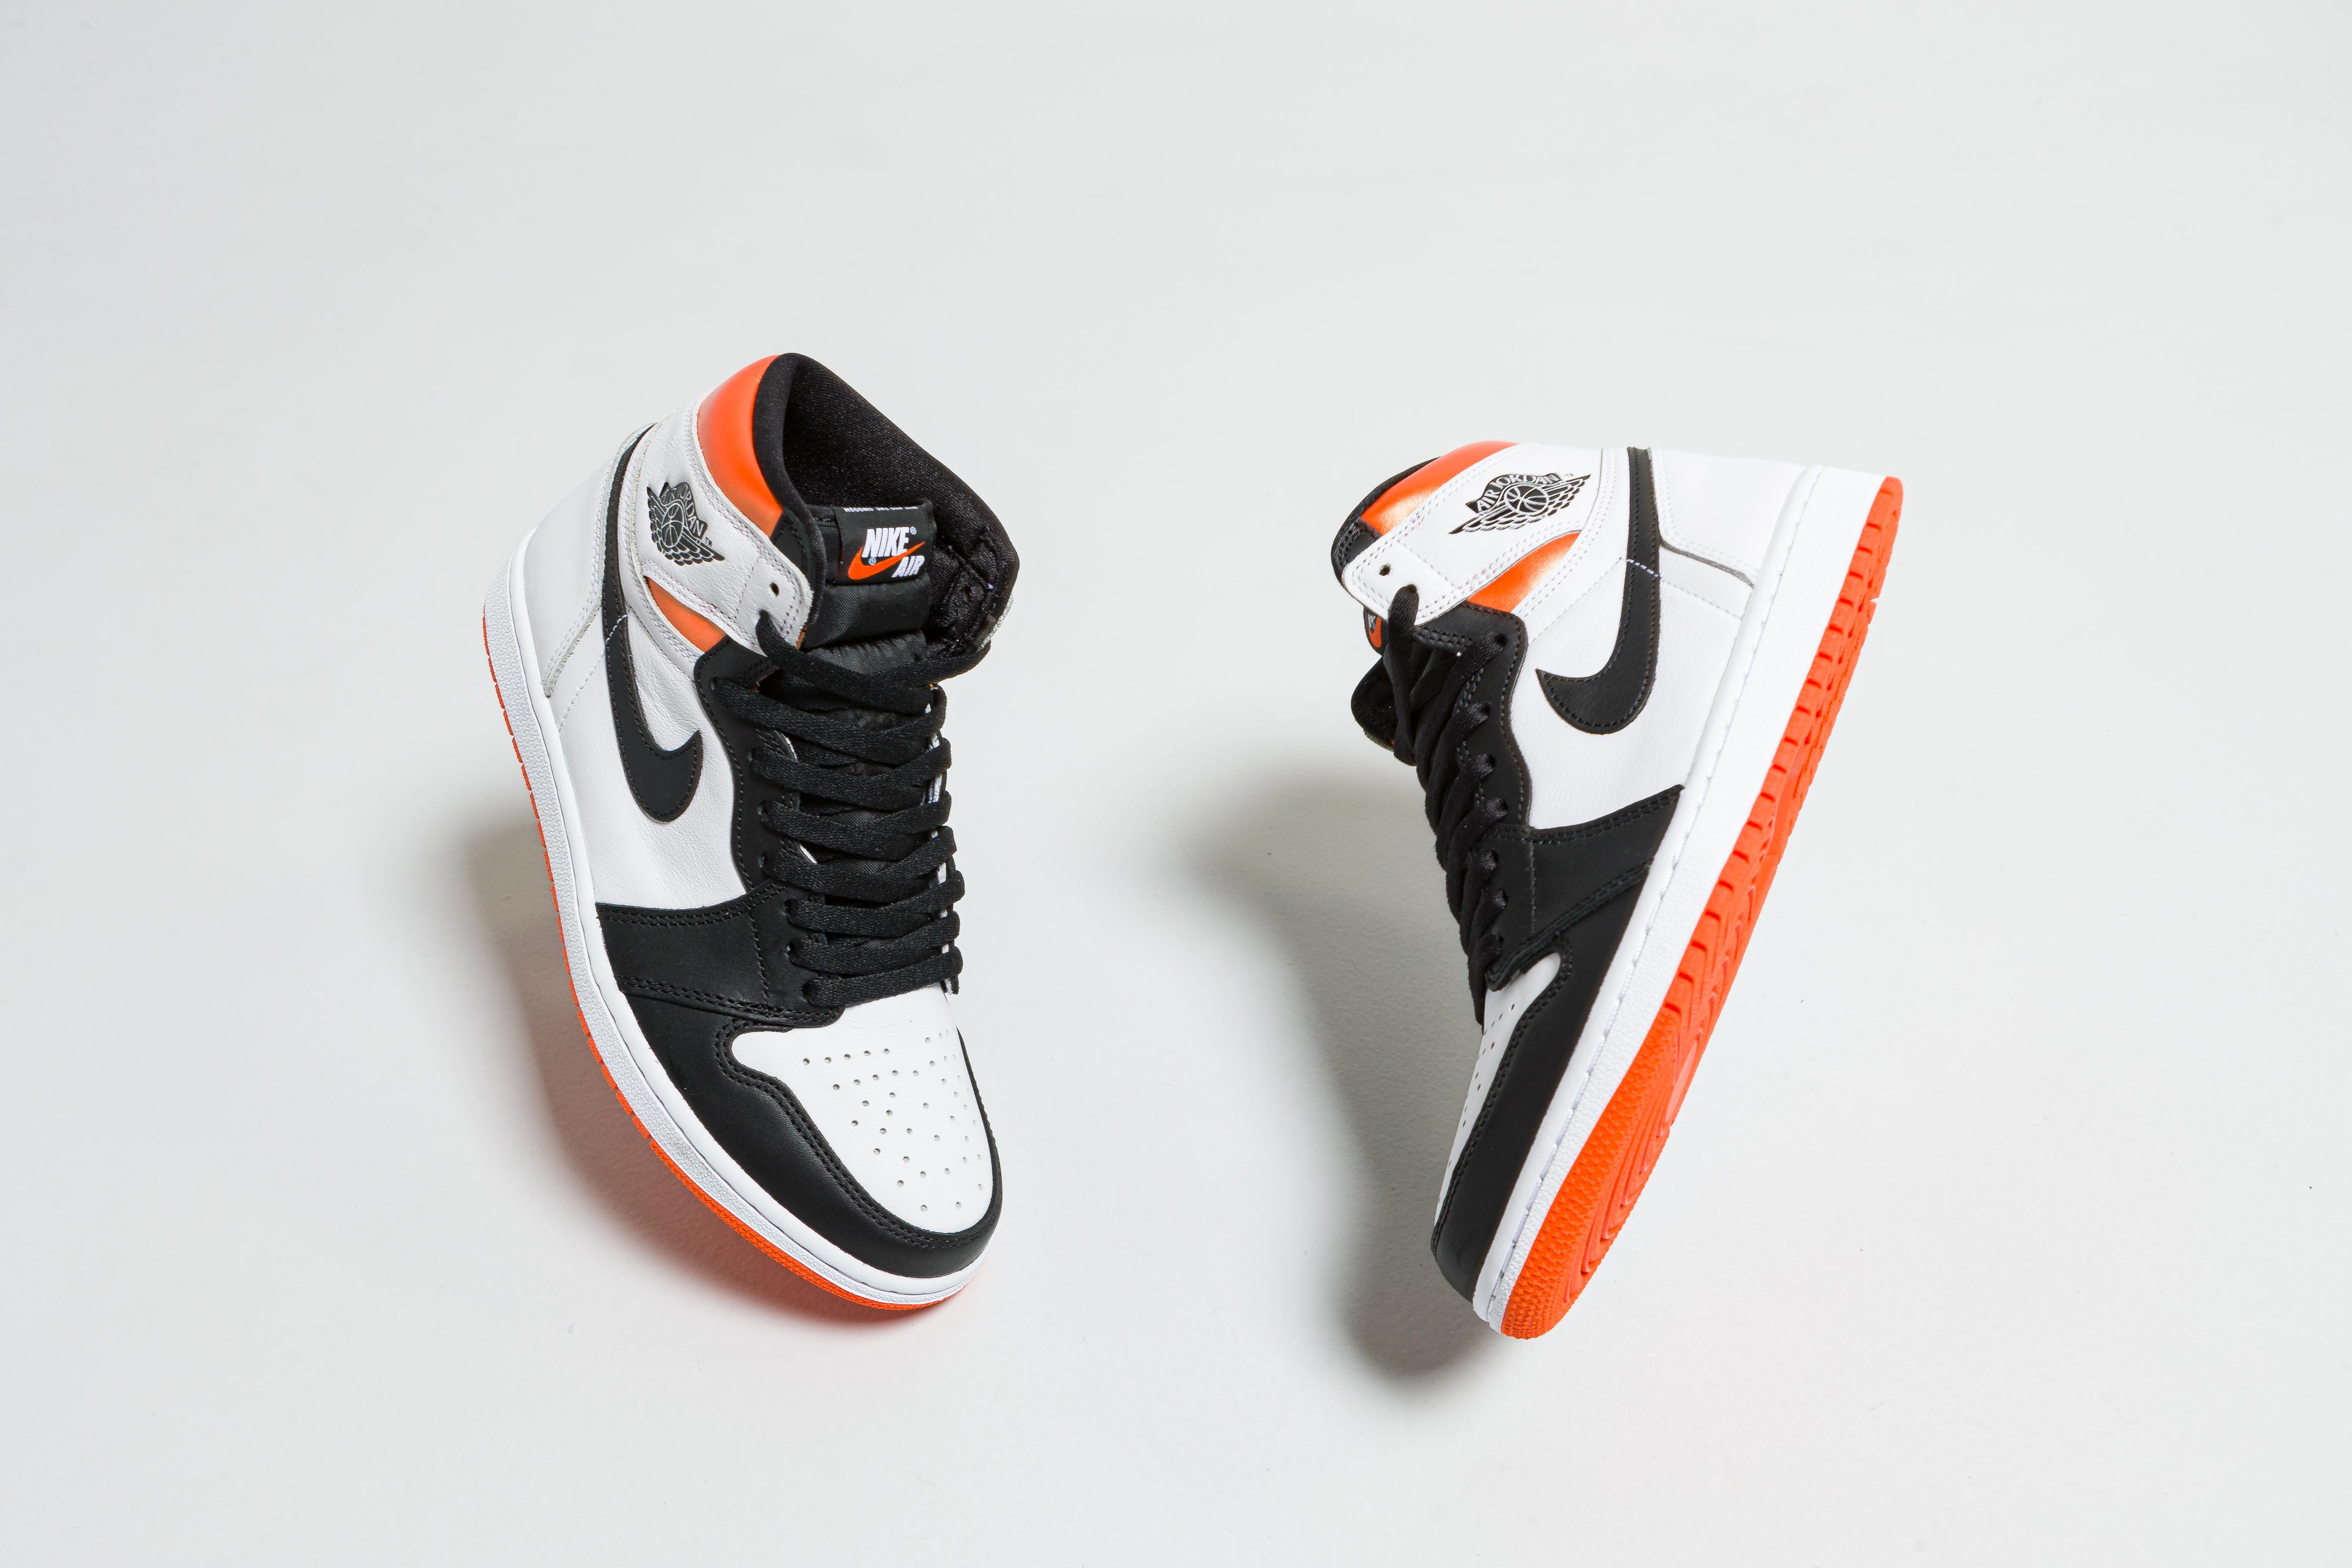 Jordan - Air Jordan 1 Retro High OG - White/Black-Electro Orange - Up There